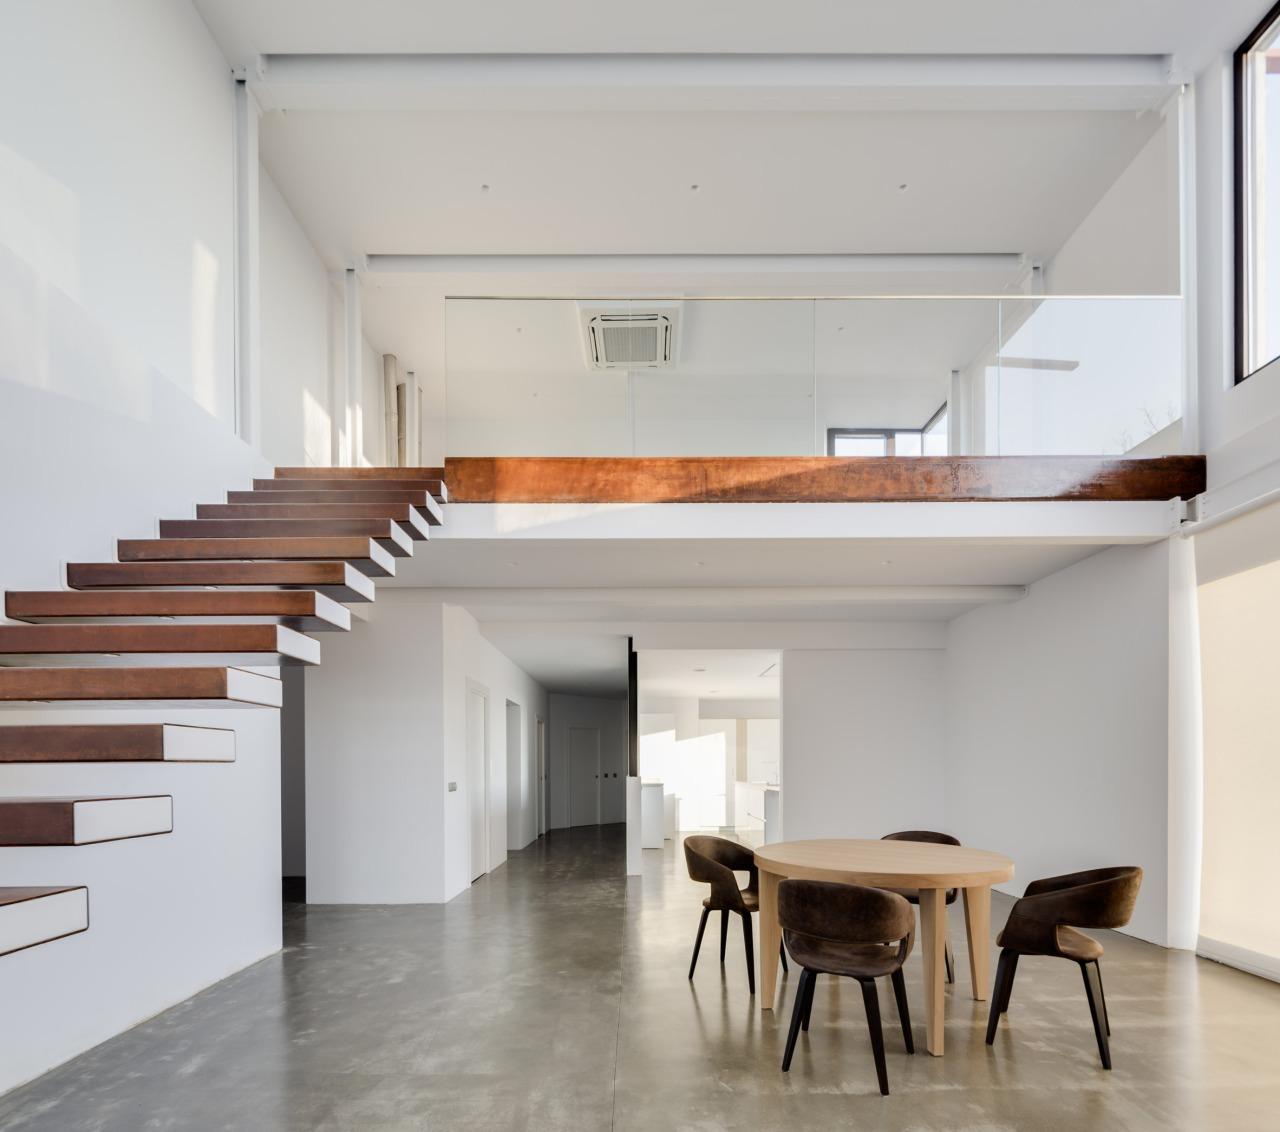 casa-vms-marcos-miguelez-architecture-residential-spain-stone-_dezeen_2364_col_6